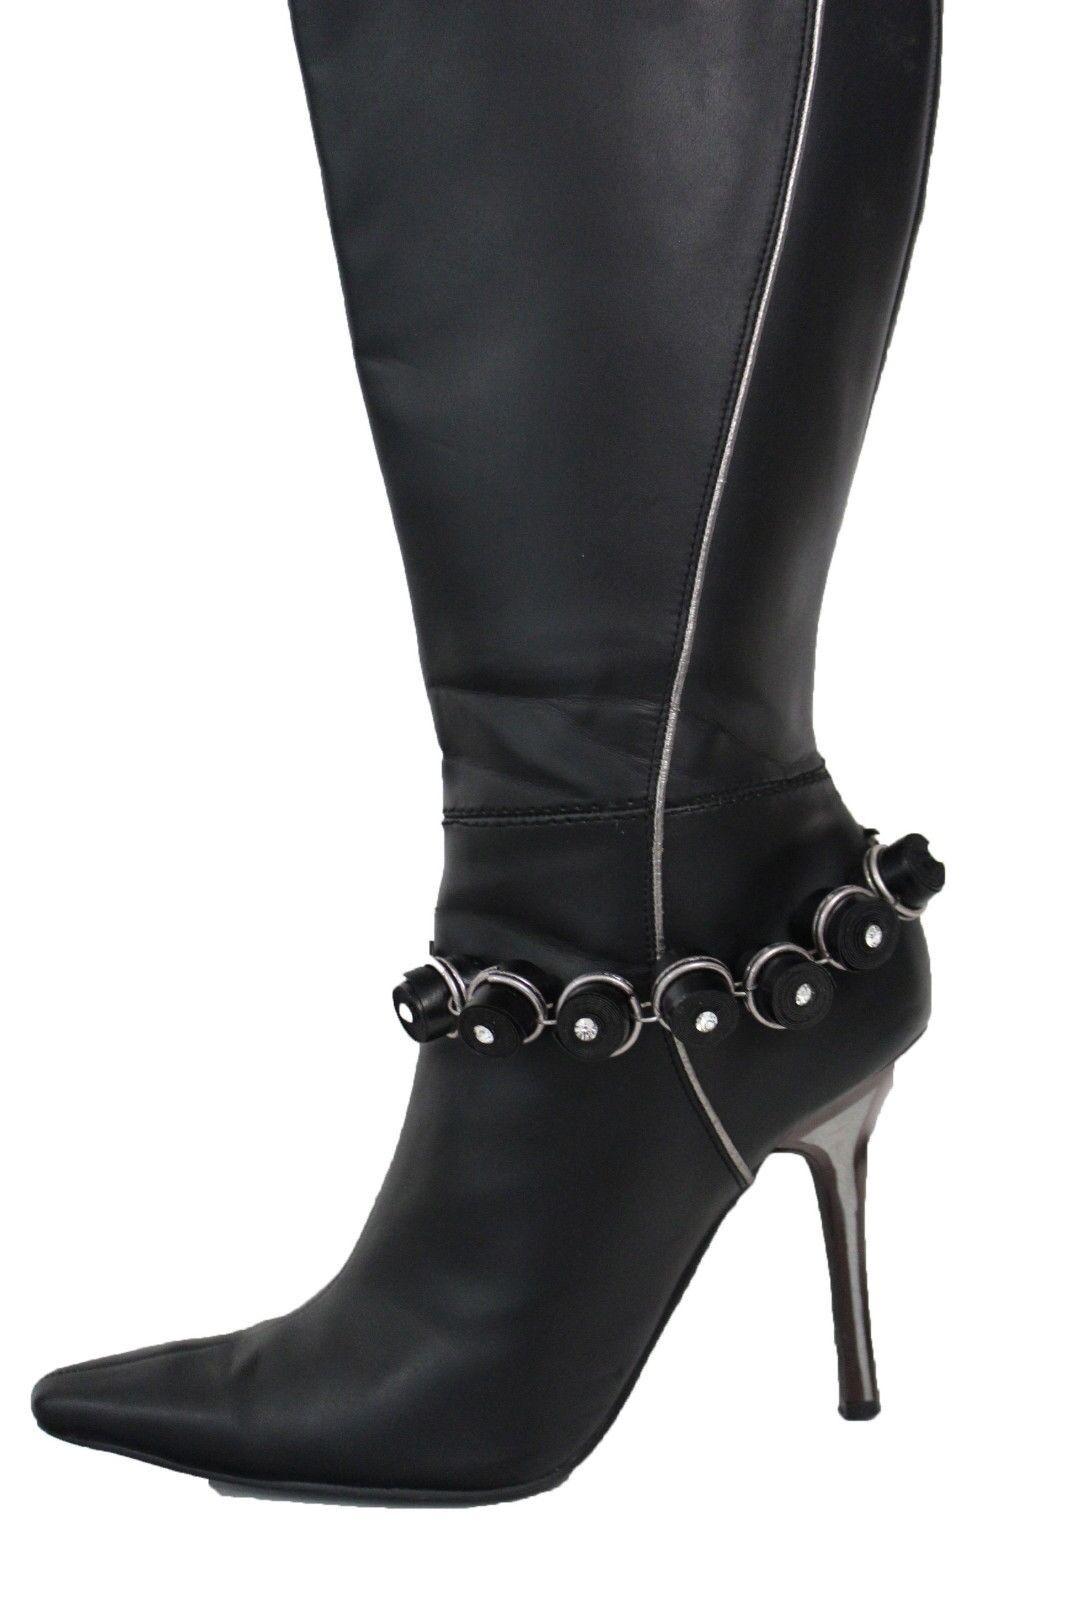 Women Boot Bracelet Silver Metal Chain Bling Anklet Shoe Black Fabric Charm Bead